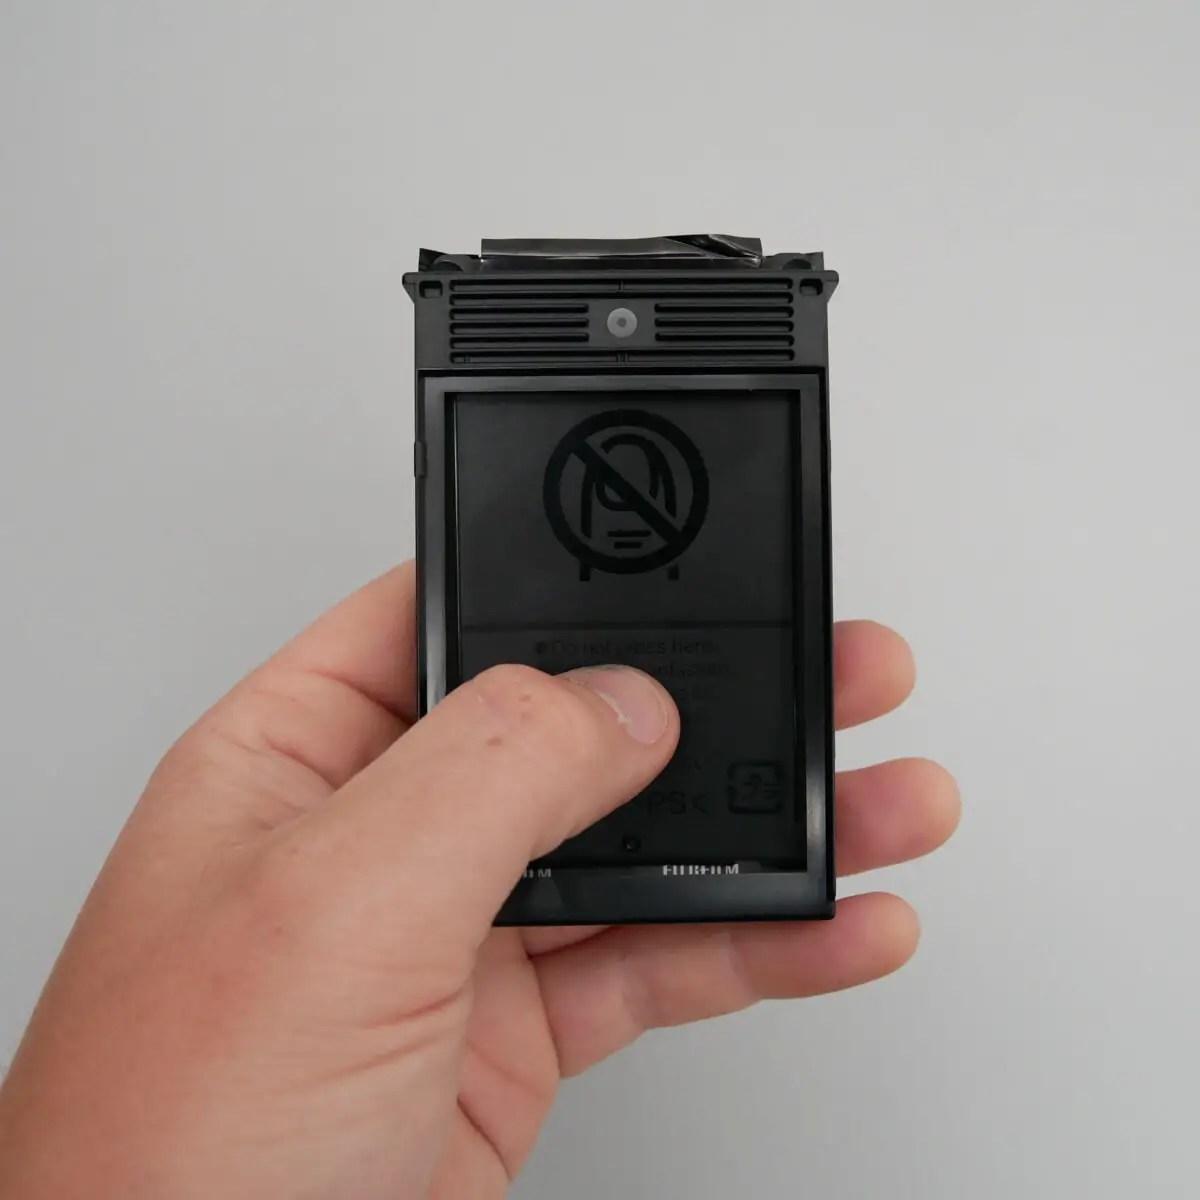 Extraction 1 - Fujifilm Instax Mini in a 35mm camera